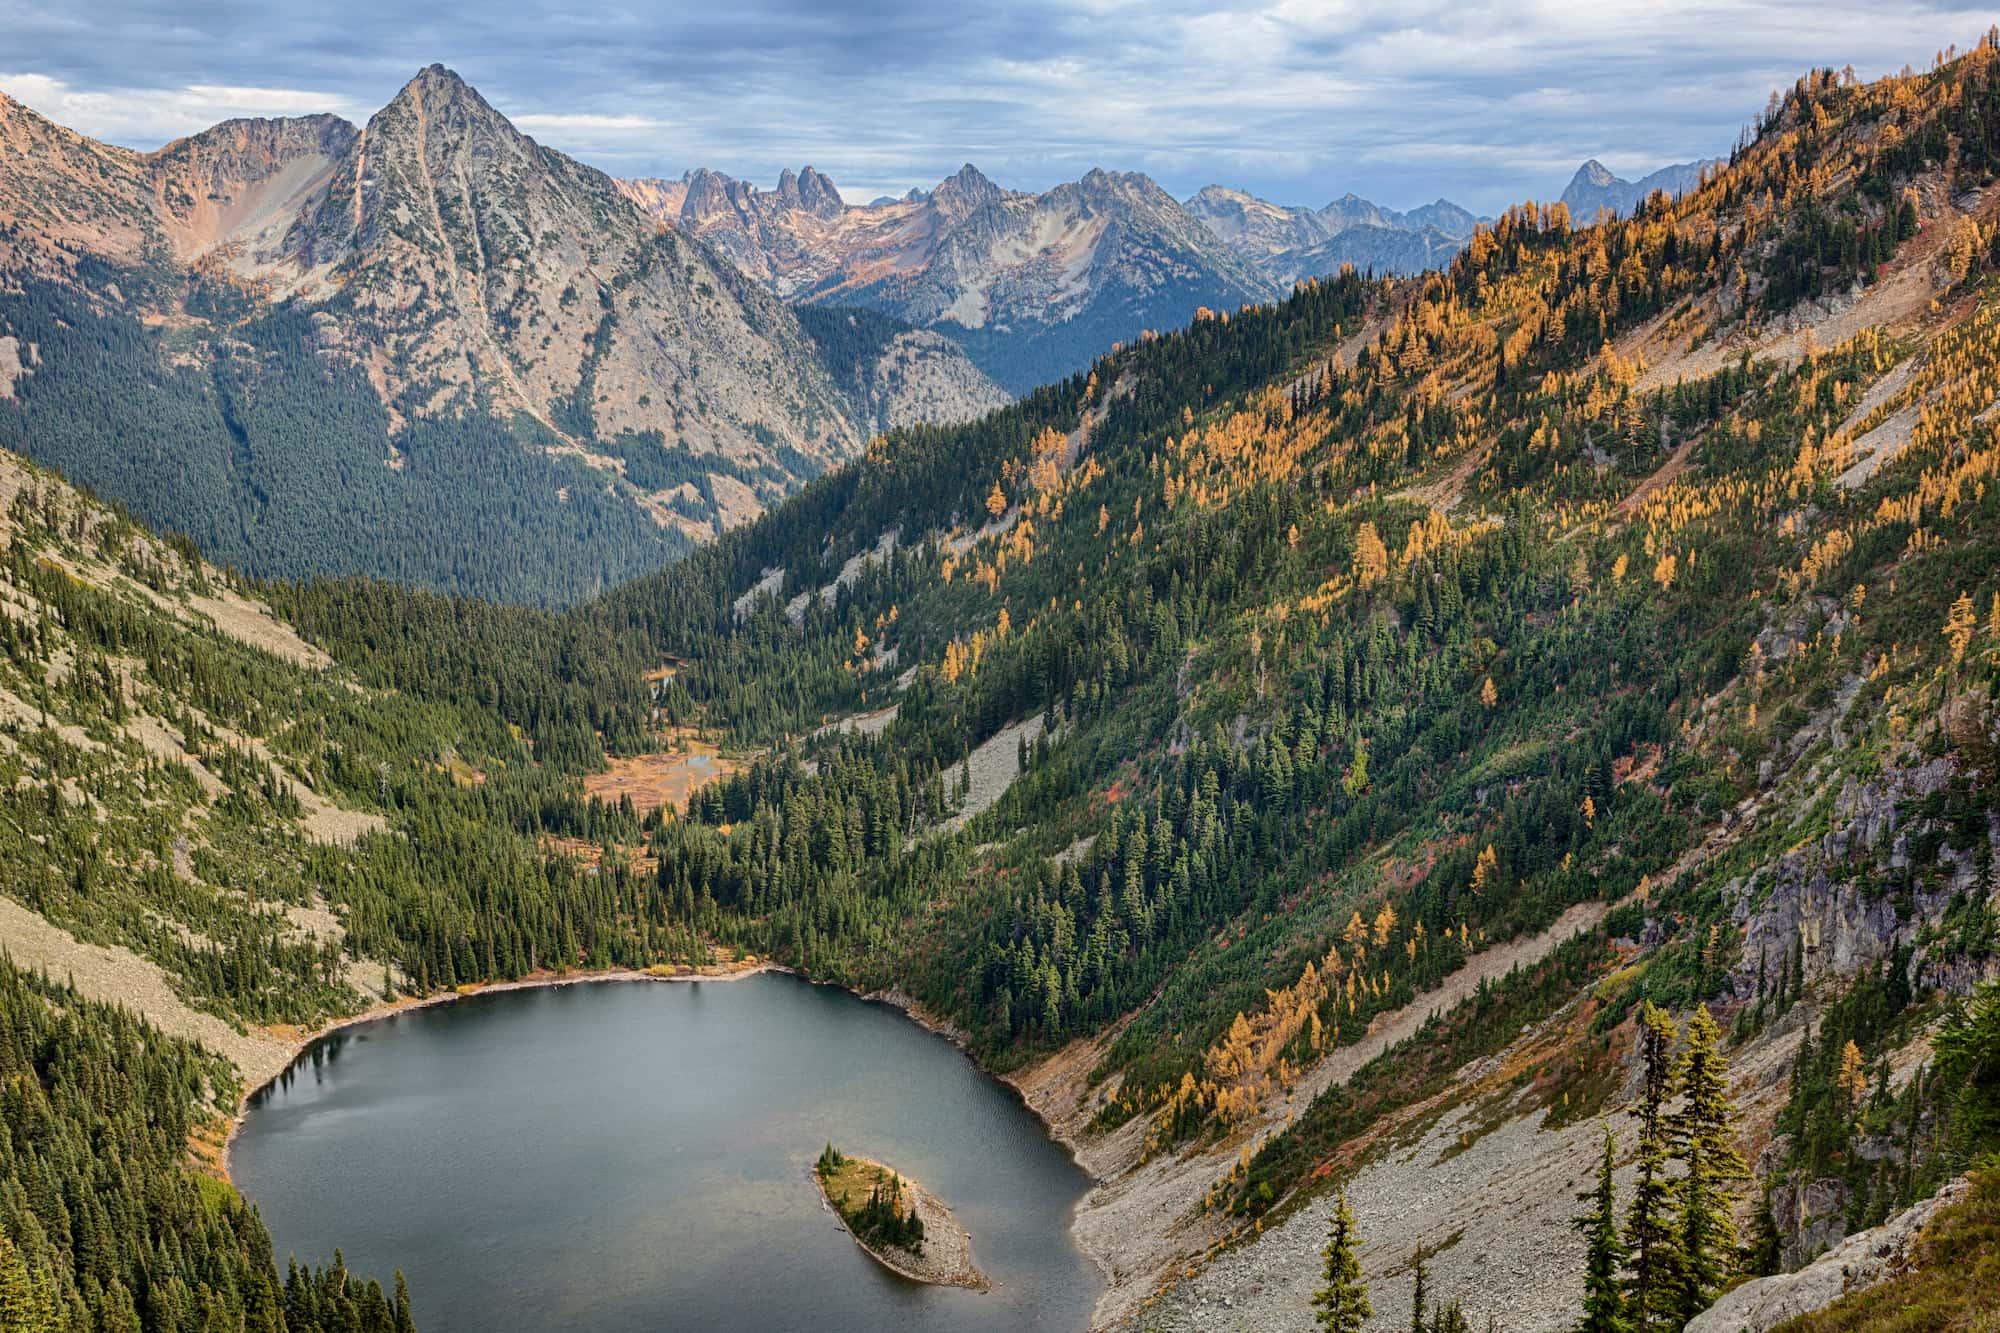 large mountains with alpine lake